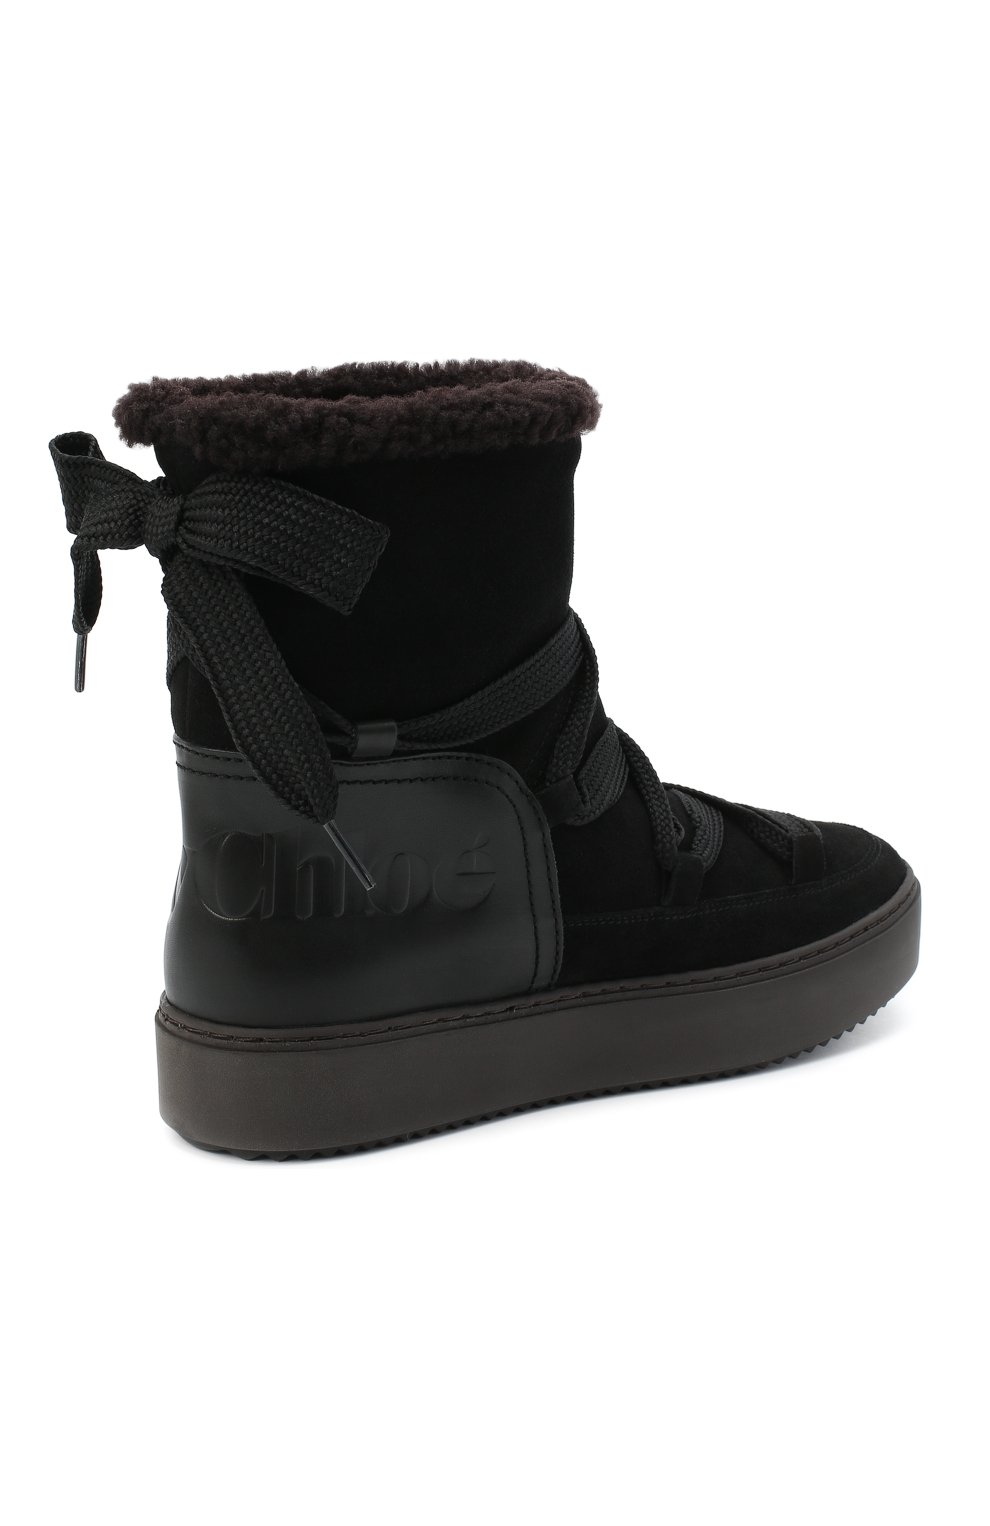 Женские замшевые ботинки SEE BY CHLOÉ черного цвета, арт. SB35151A/12230 | Фото 4